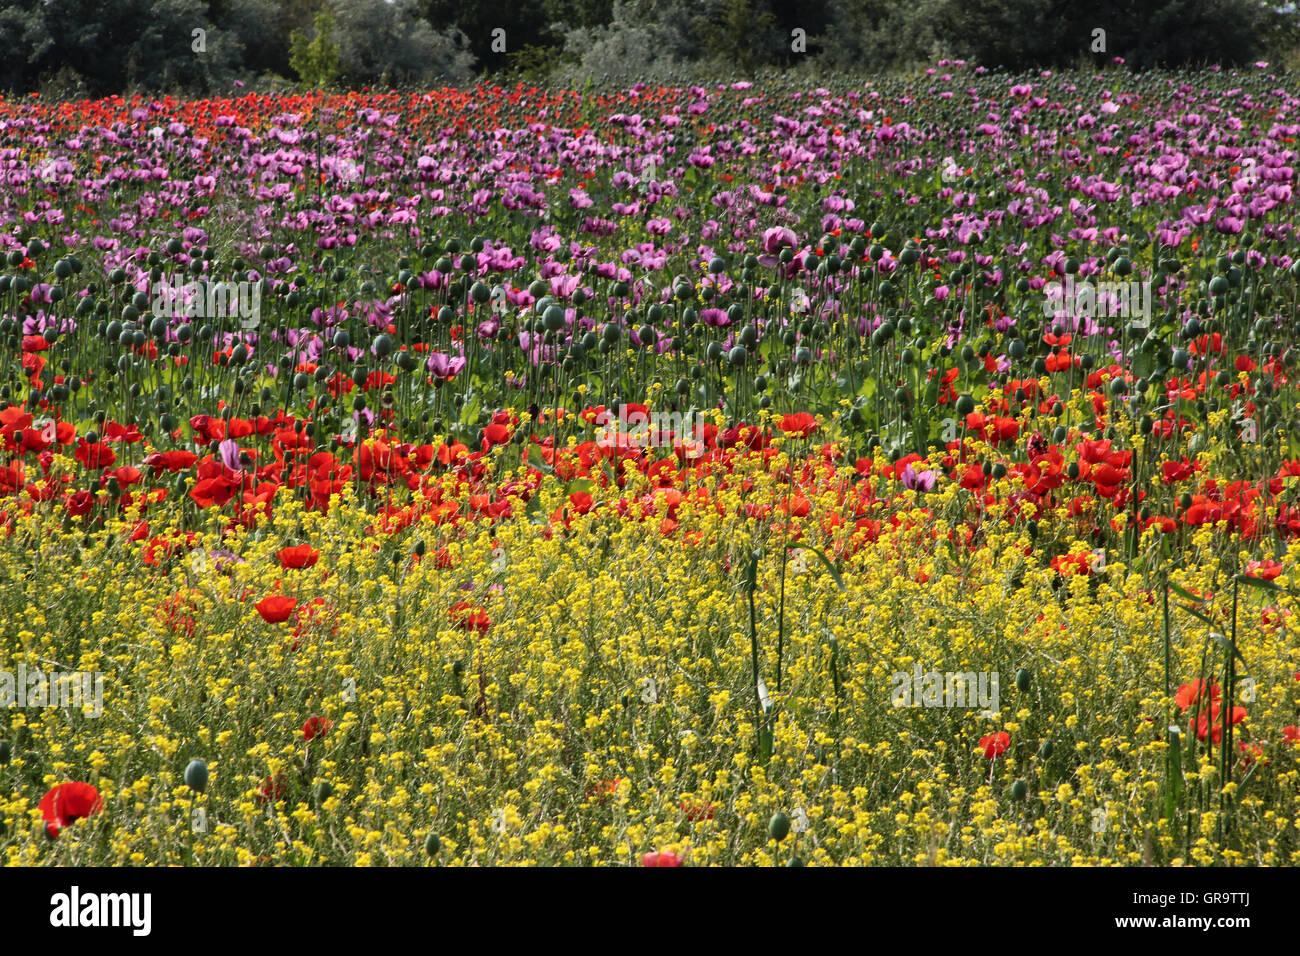 Summery Poppy Field In Burgenland, Austria - Stock Image